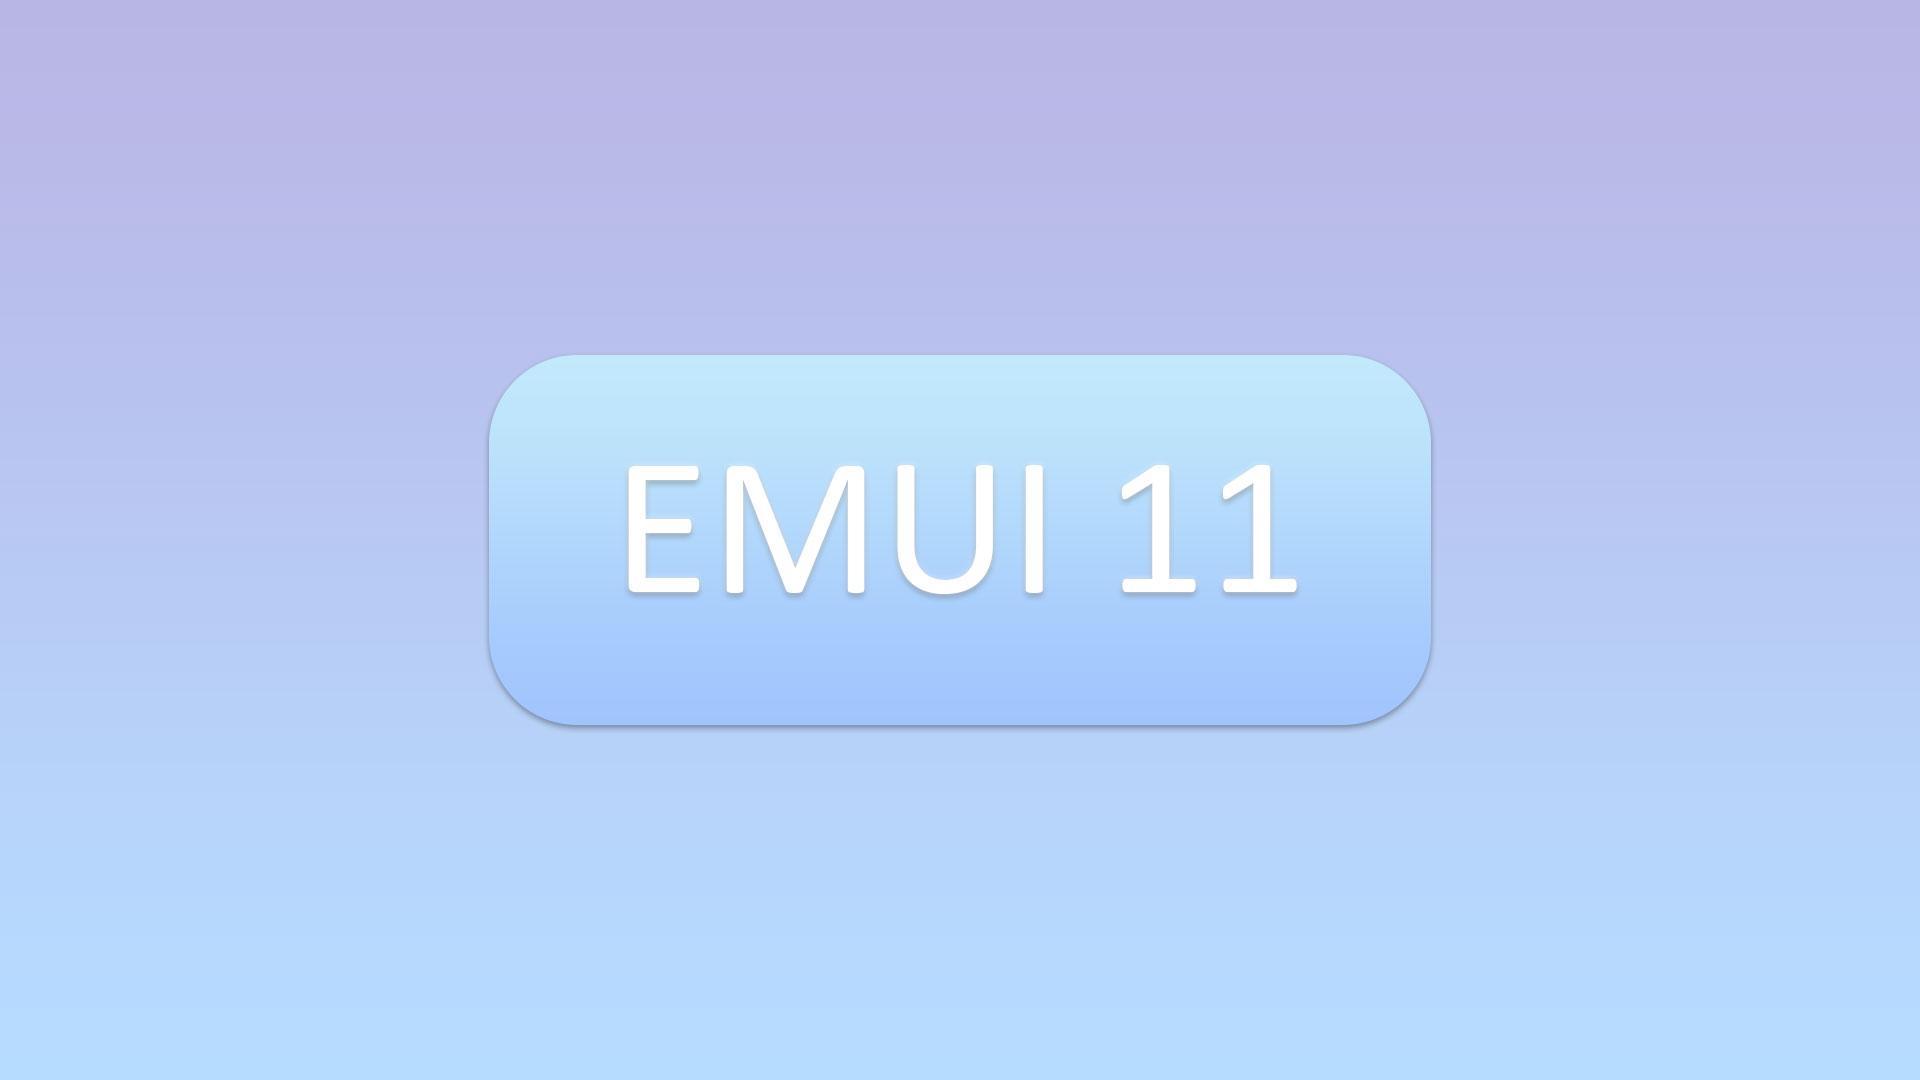 Названы смартфоны Huawei/Honor, которые не получат EMUI 11 / 10.1